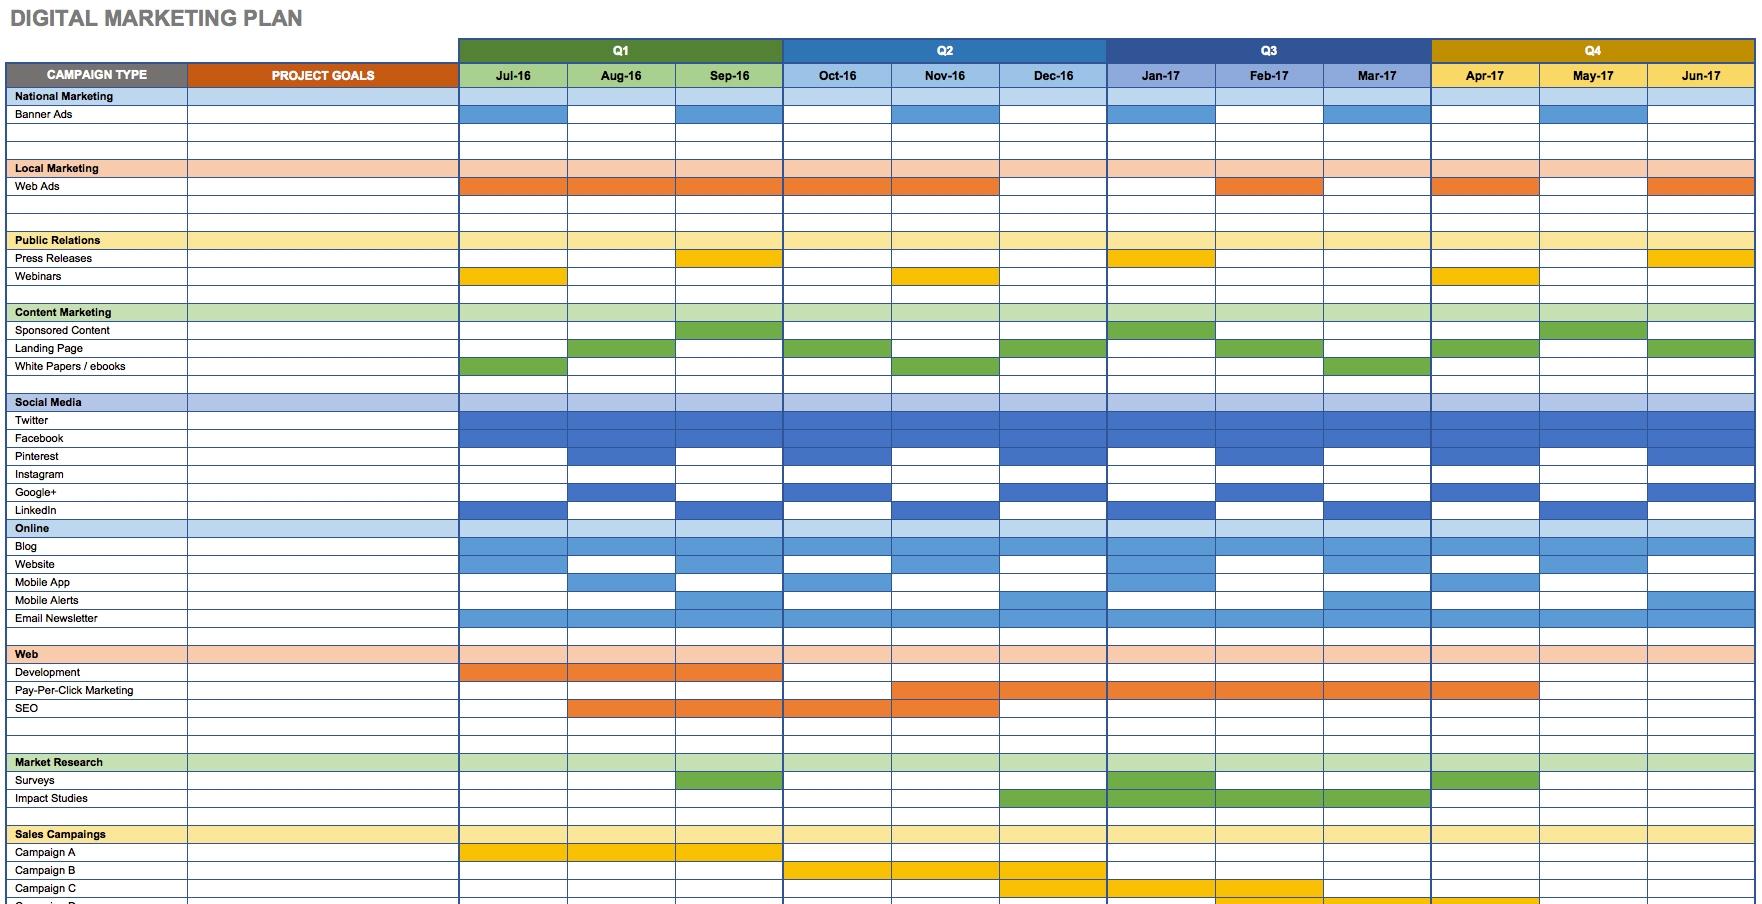 Free Marketing Plan Templates For Excel Smartsheet3abry